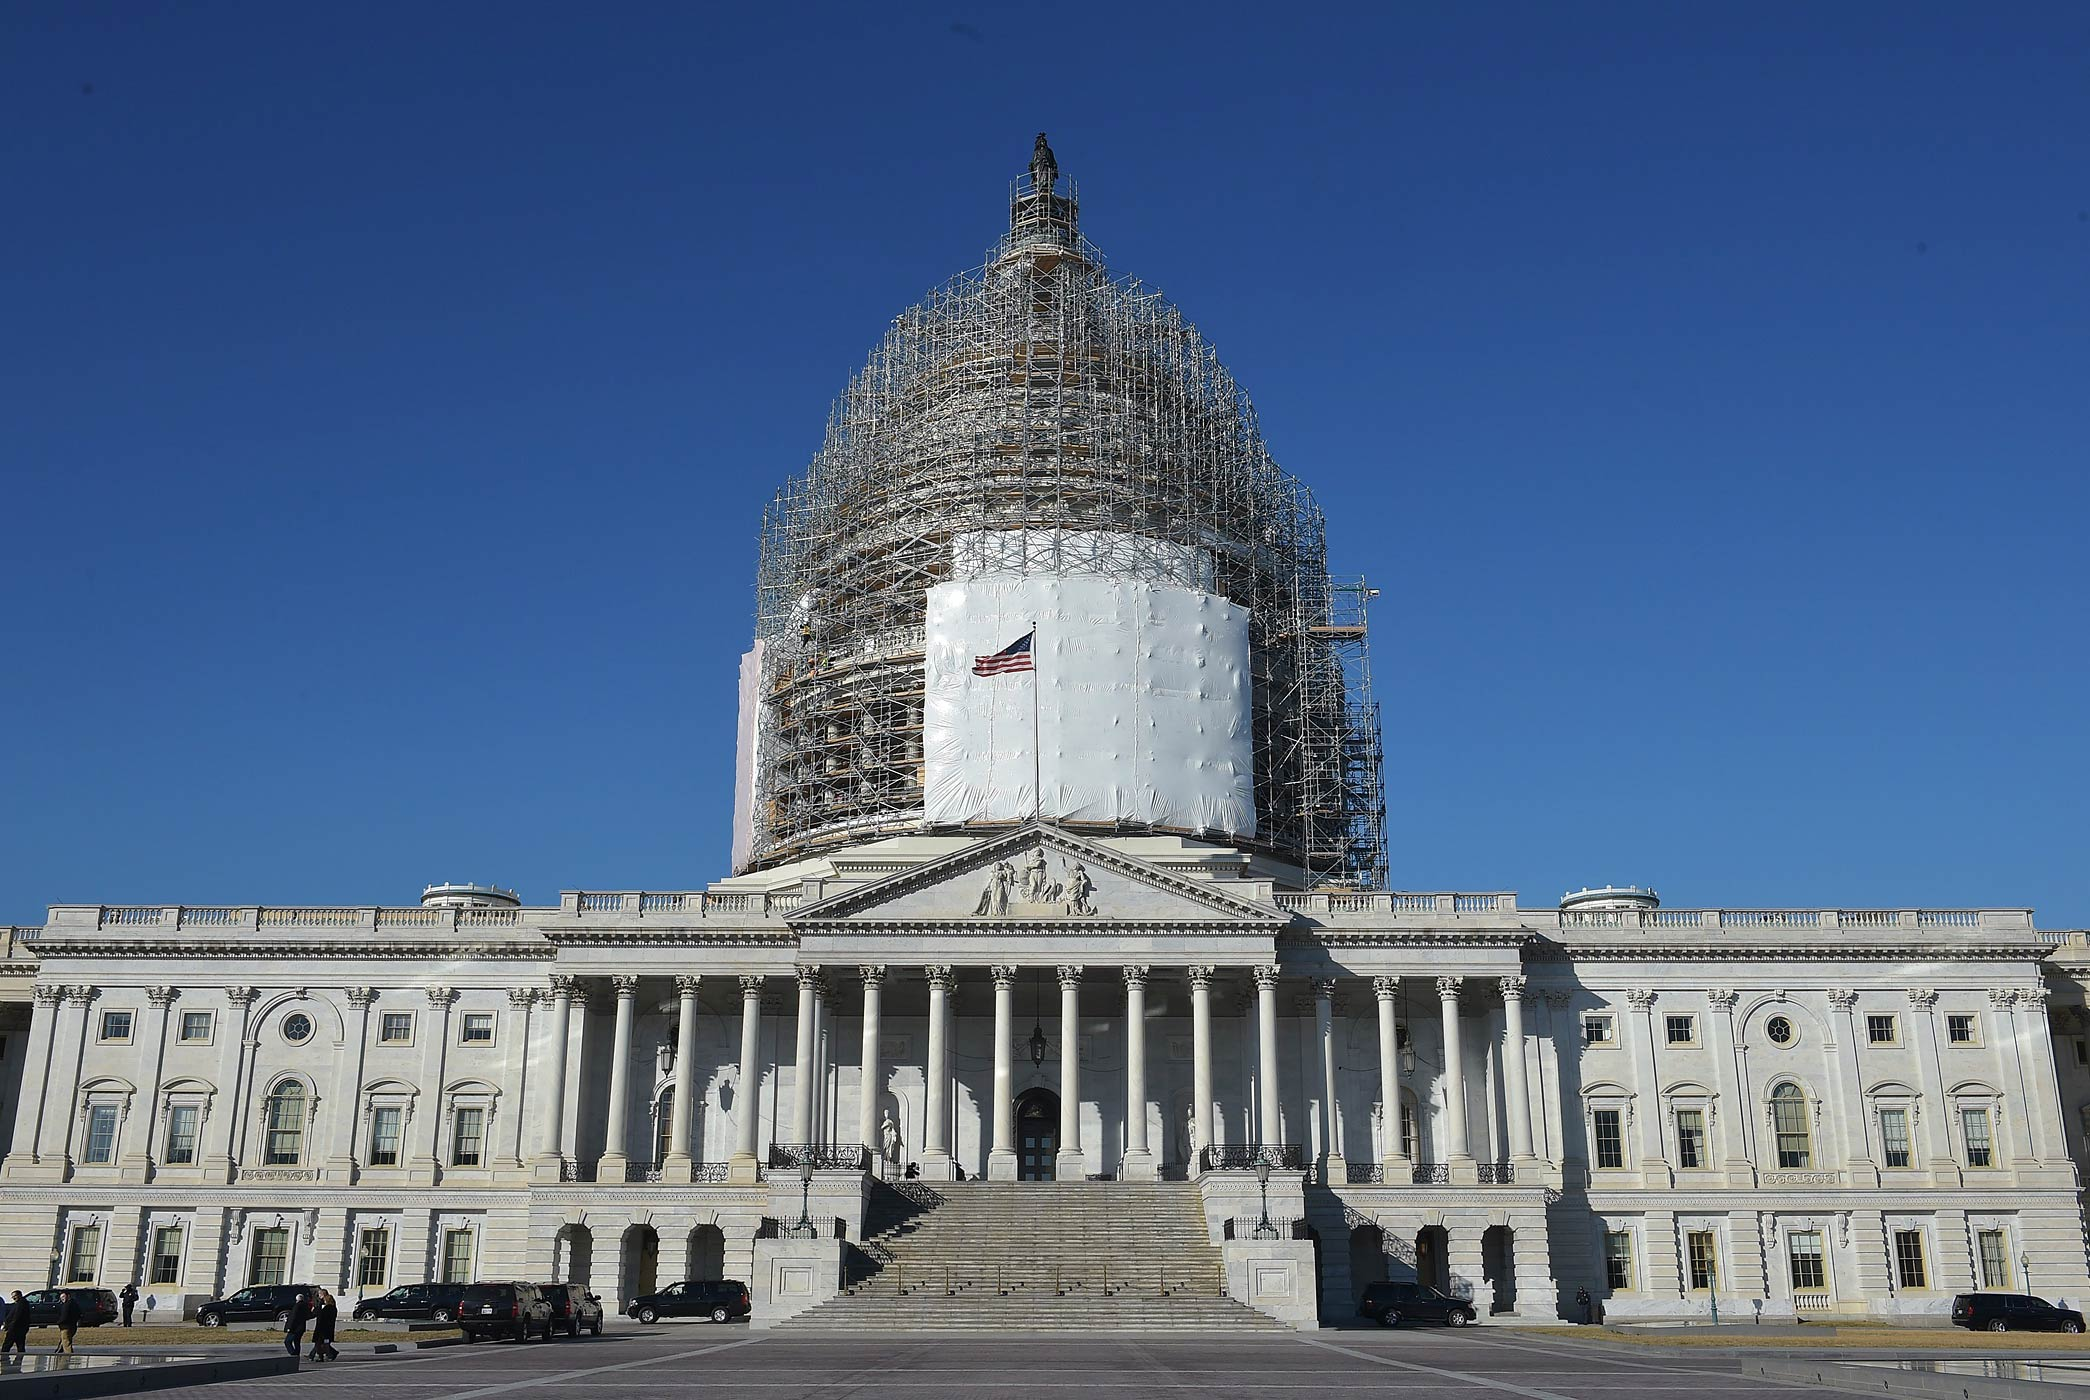 The US Capitol seen on Feb. 11, 2015 in Washington.